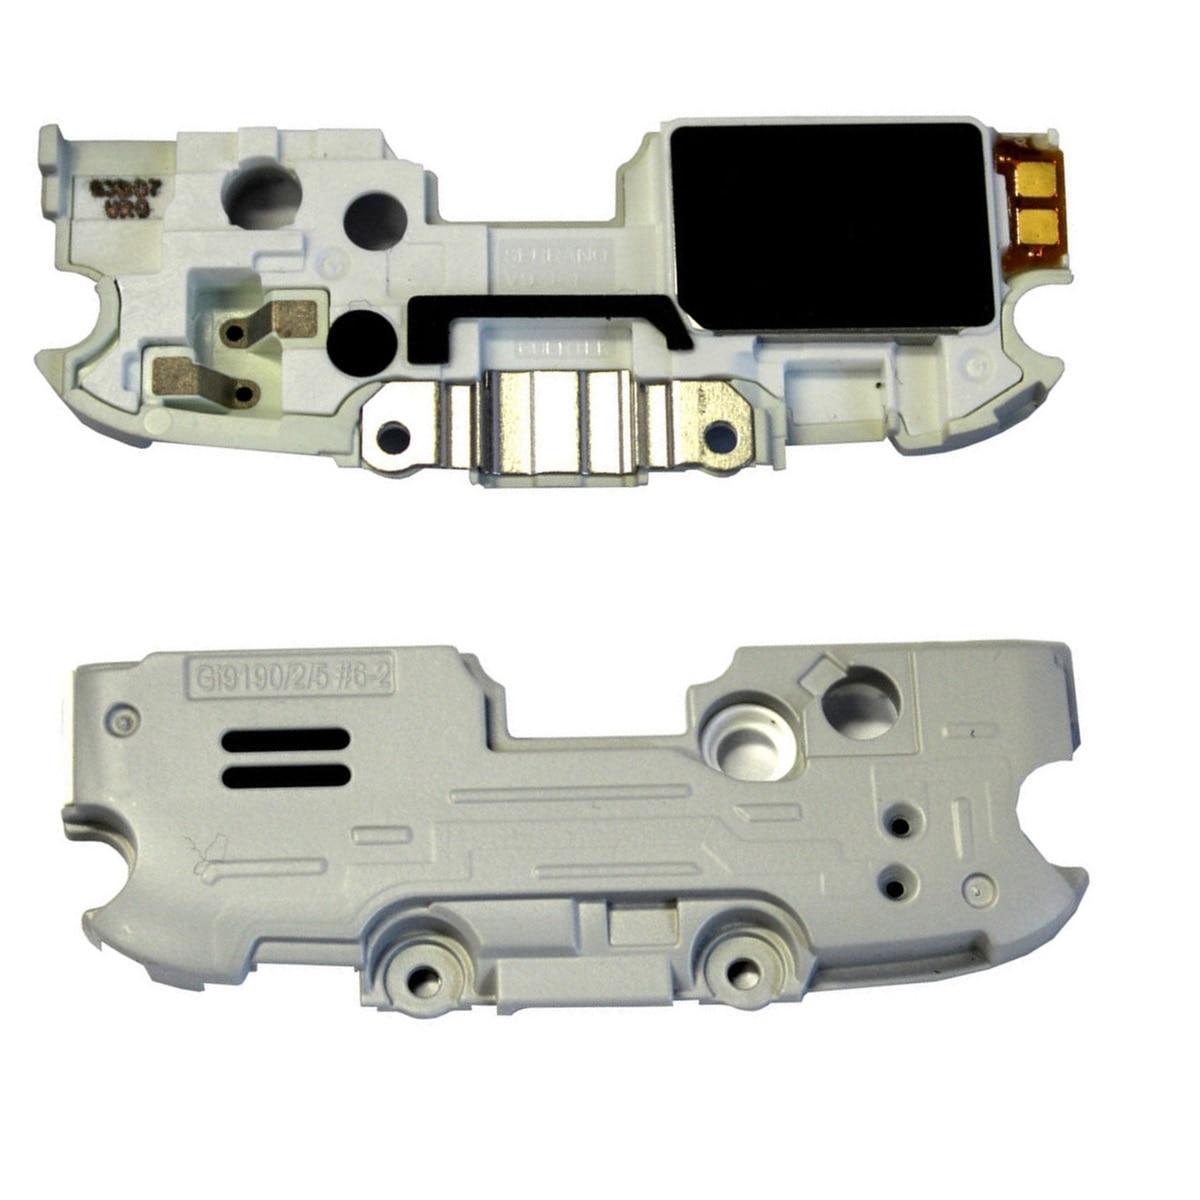 For Samsung Galaxy S4 Mini I9190 I9195 I9192 Loud Speaker Ringer Buzzer